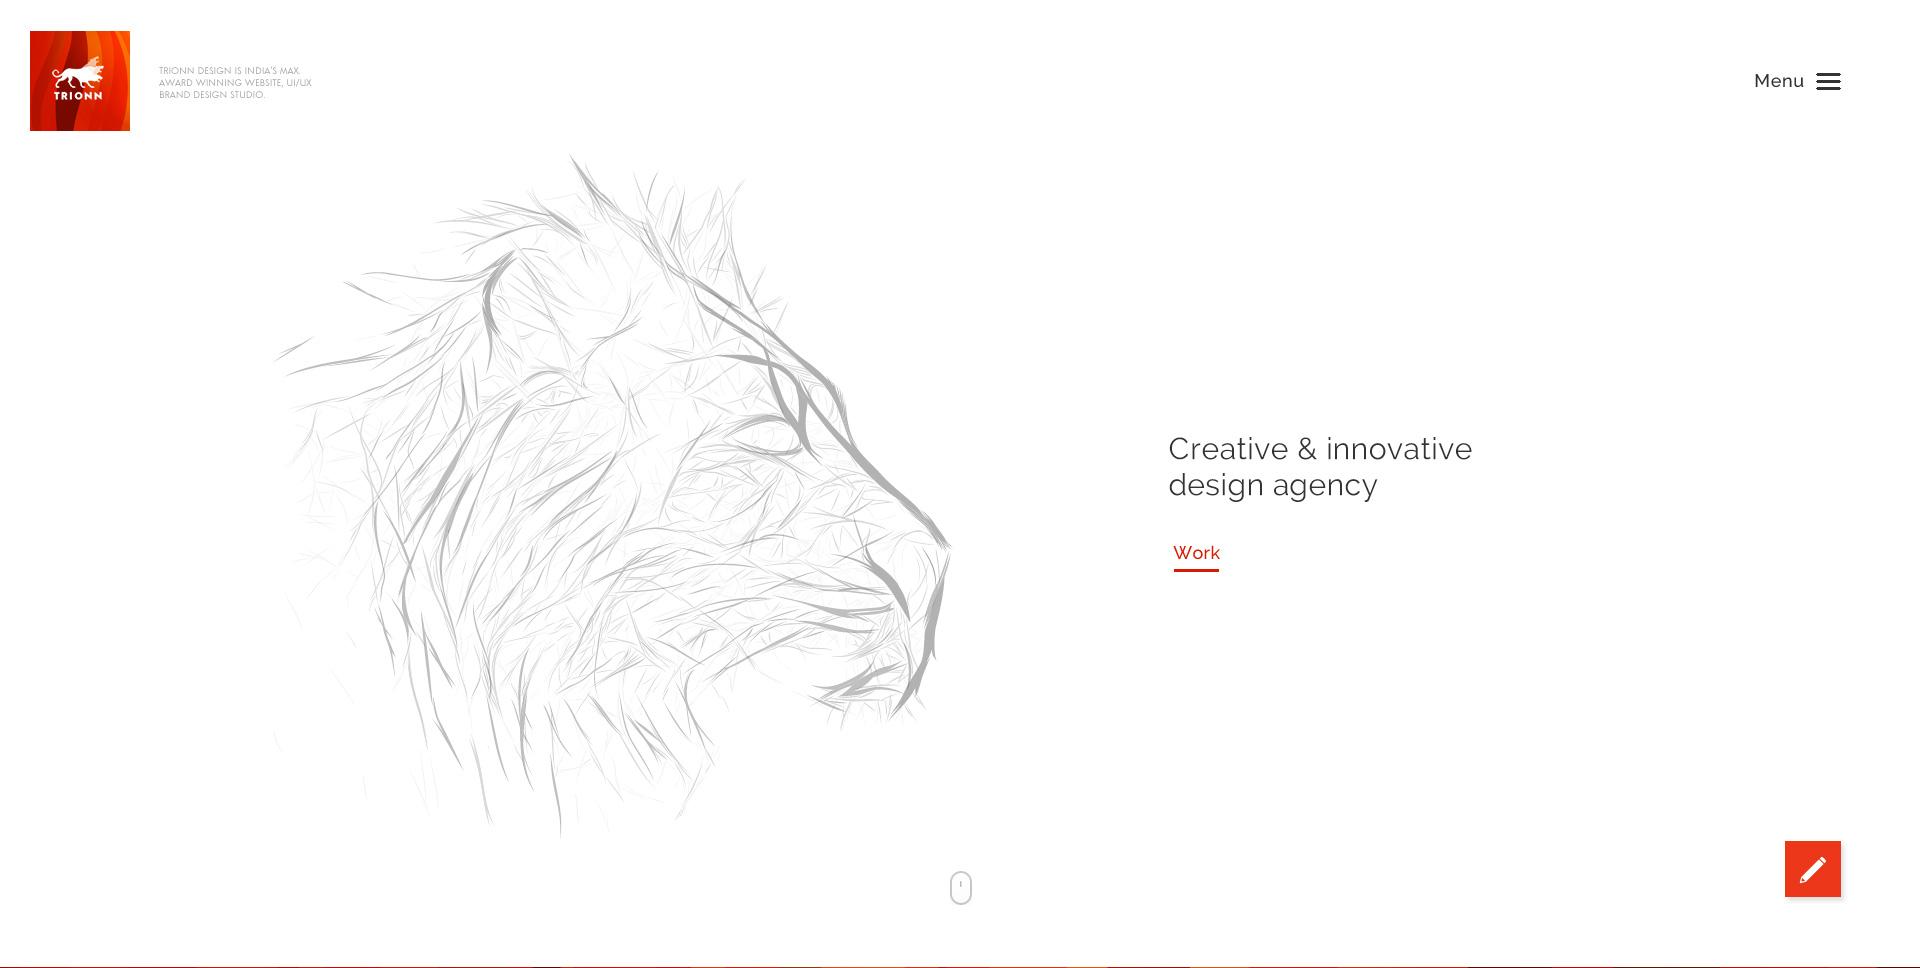 Trionn Design :  Creative and Innovative Digital Agency